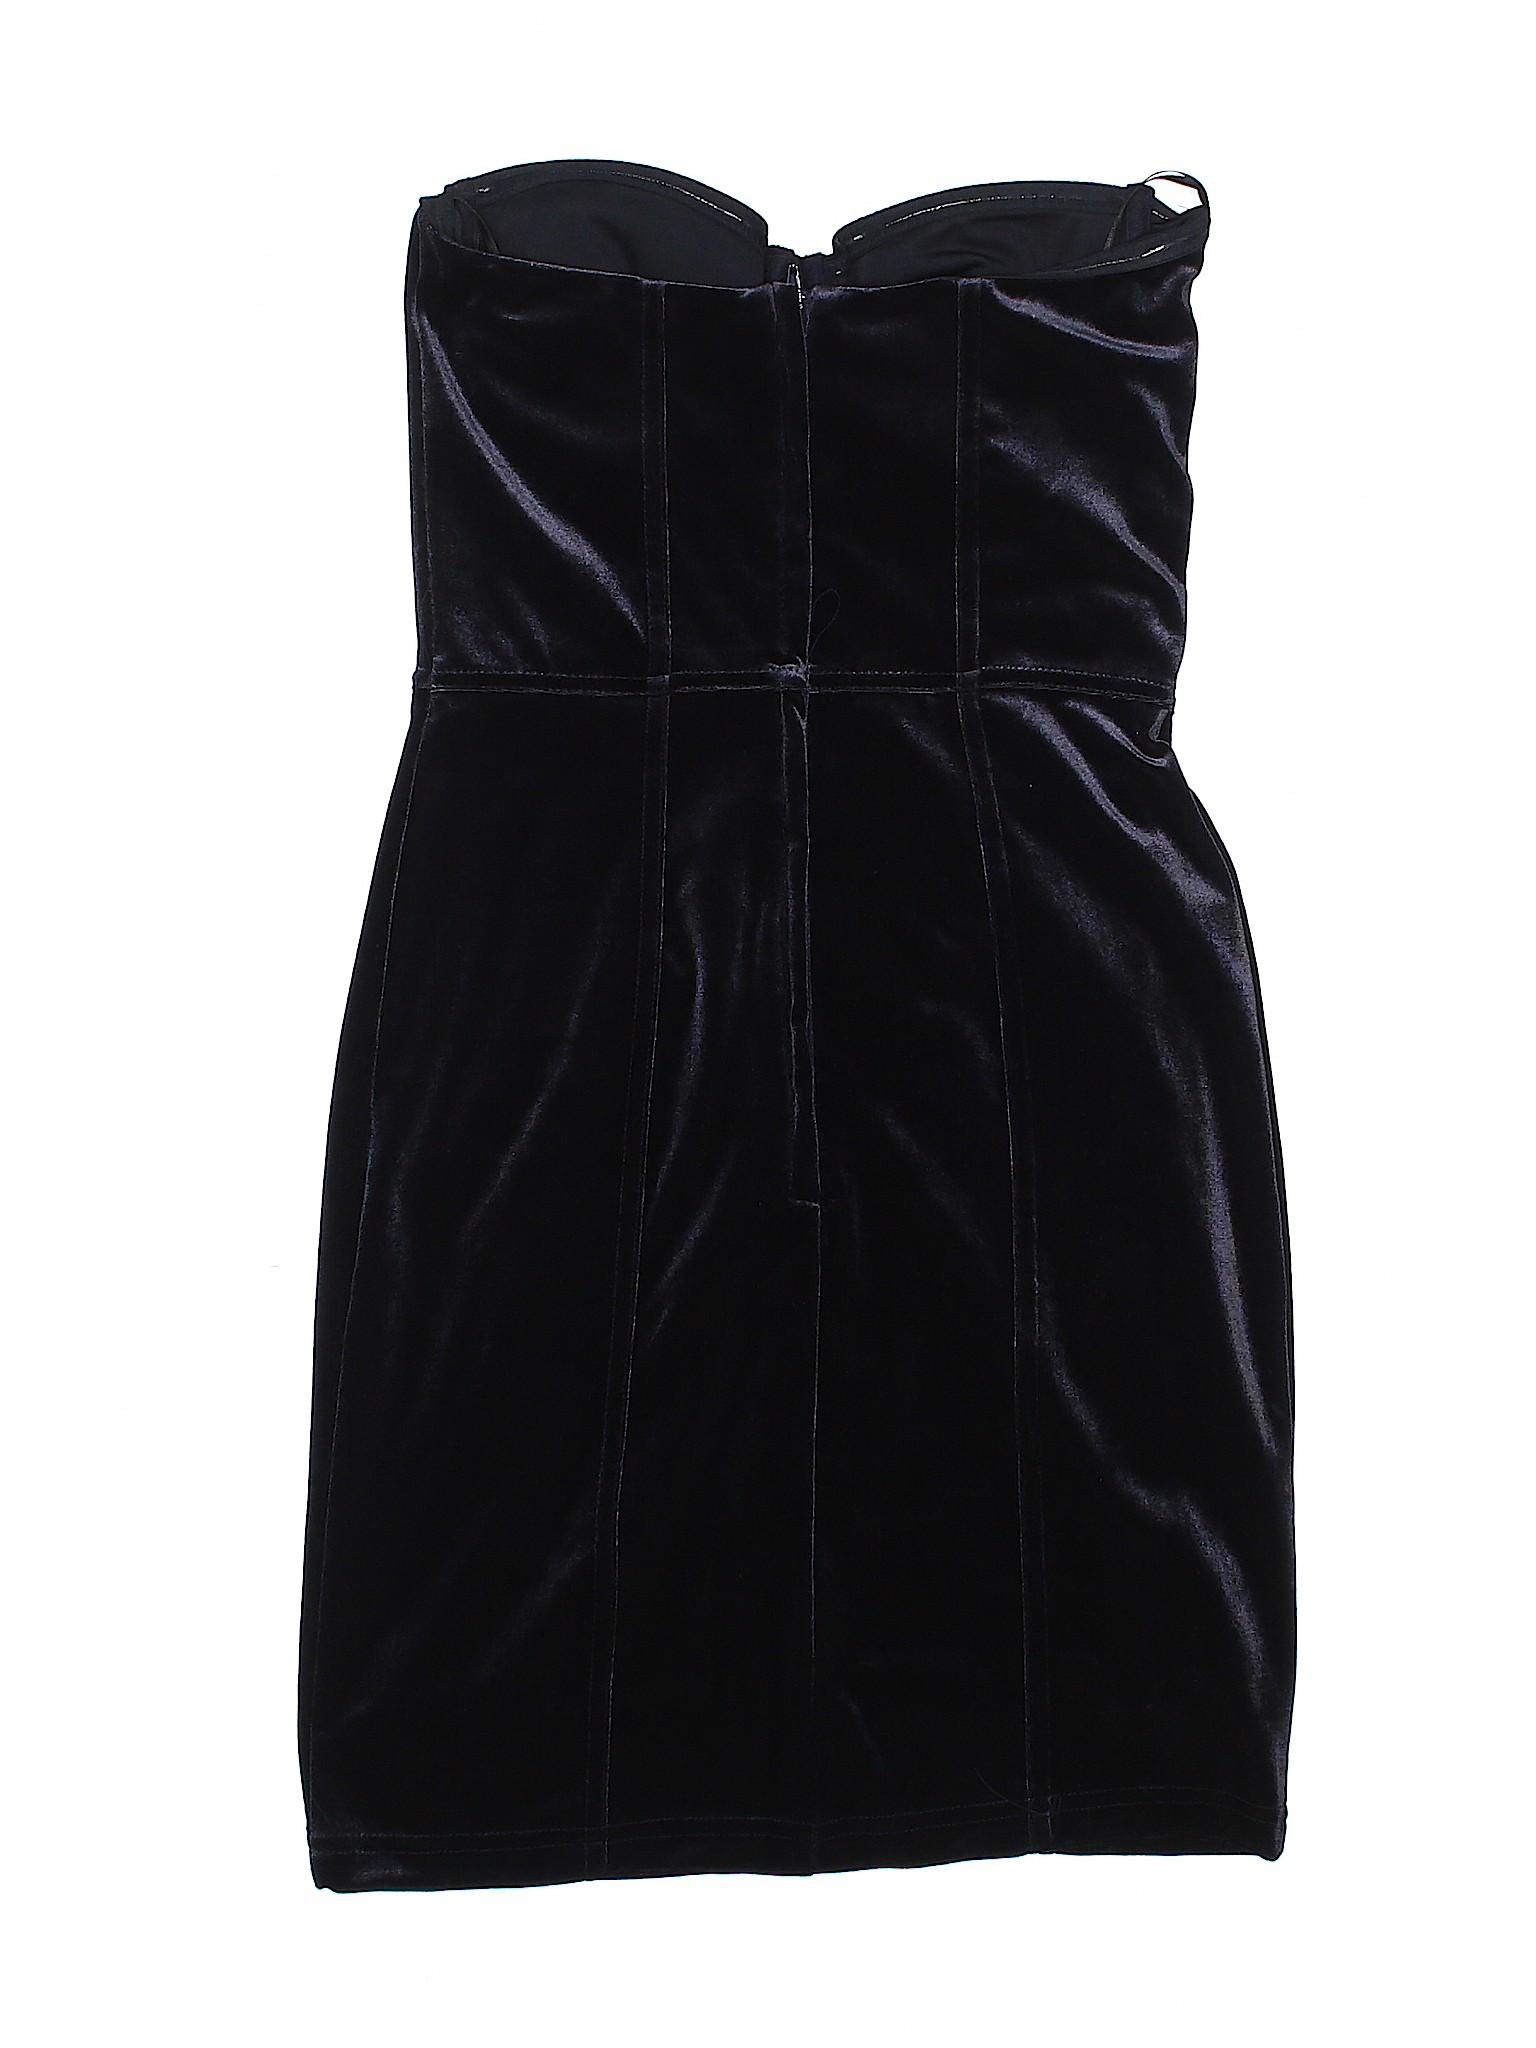 H H amp;M Selling amp;M Selling amp;M amp;M H Selling Dress Casual Dress Casual Dress Selling H Casual zpqRO